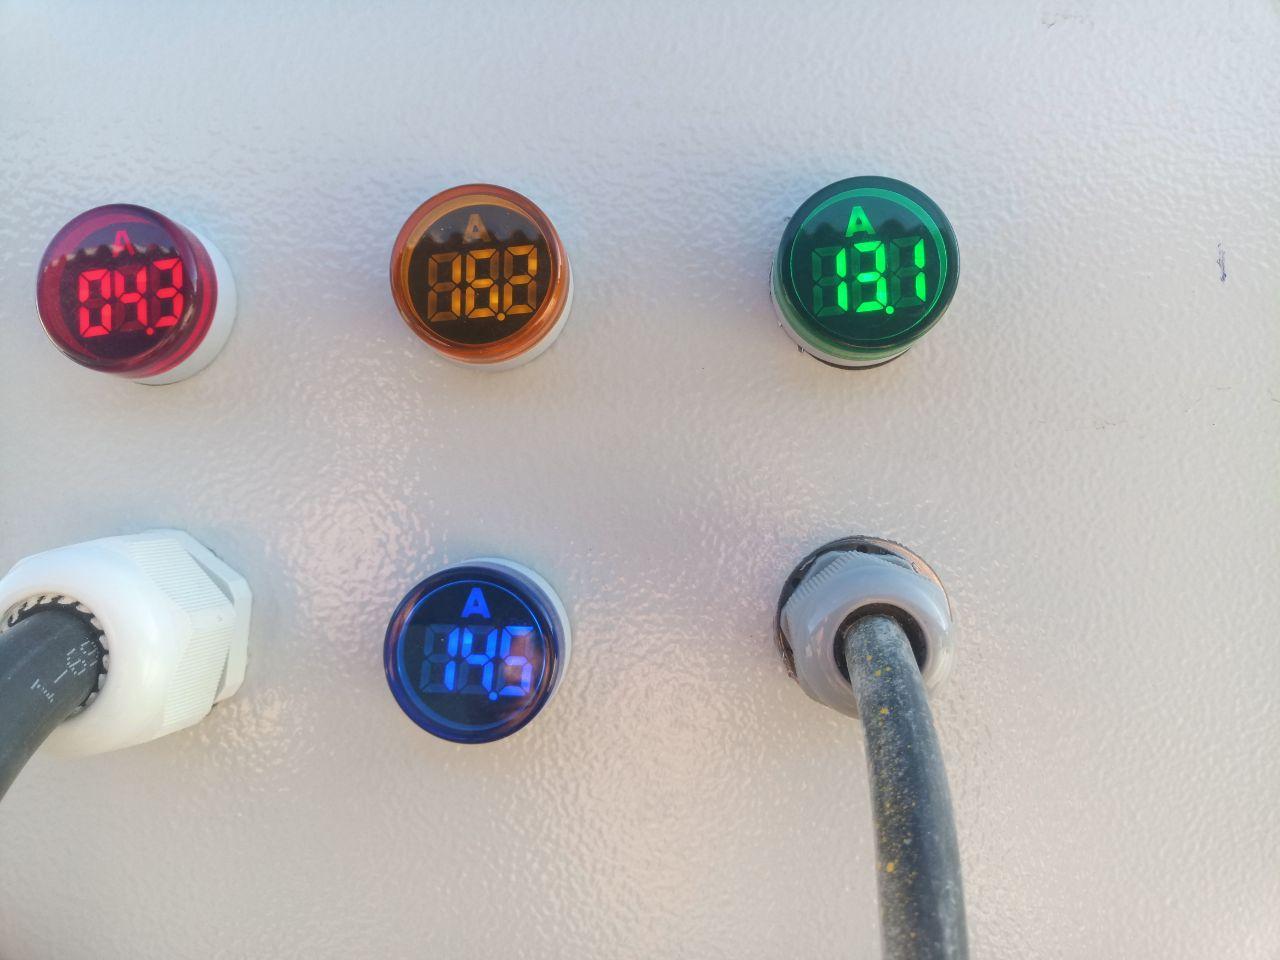 نصب چراغ سیگنال JBH روی درب تابلو